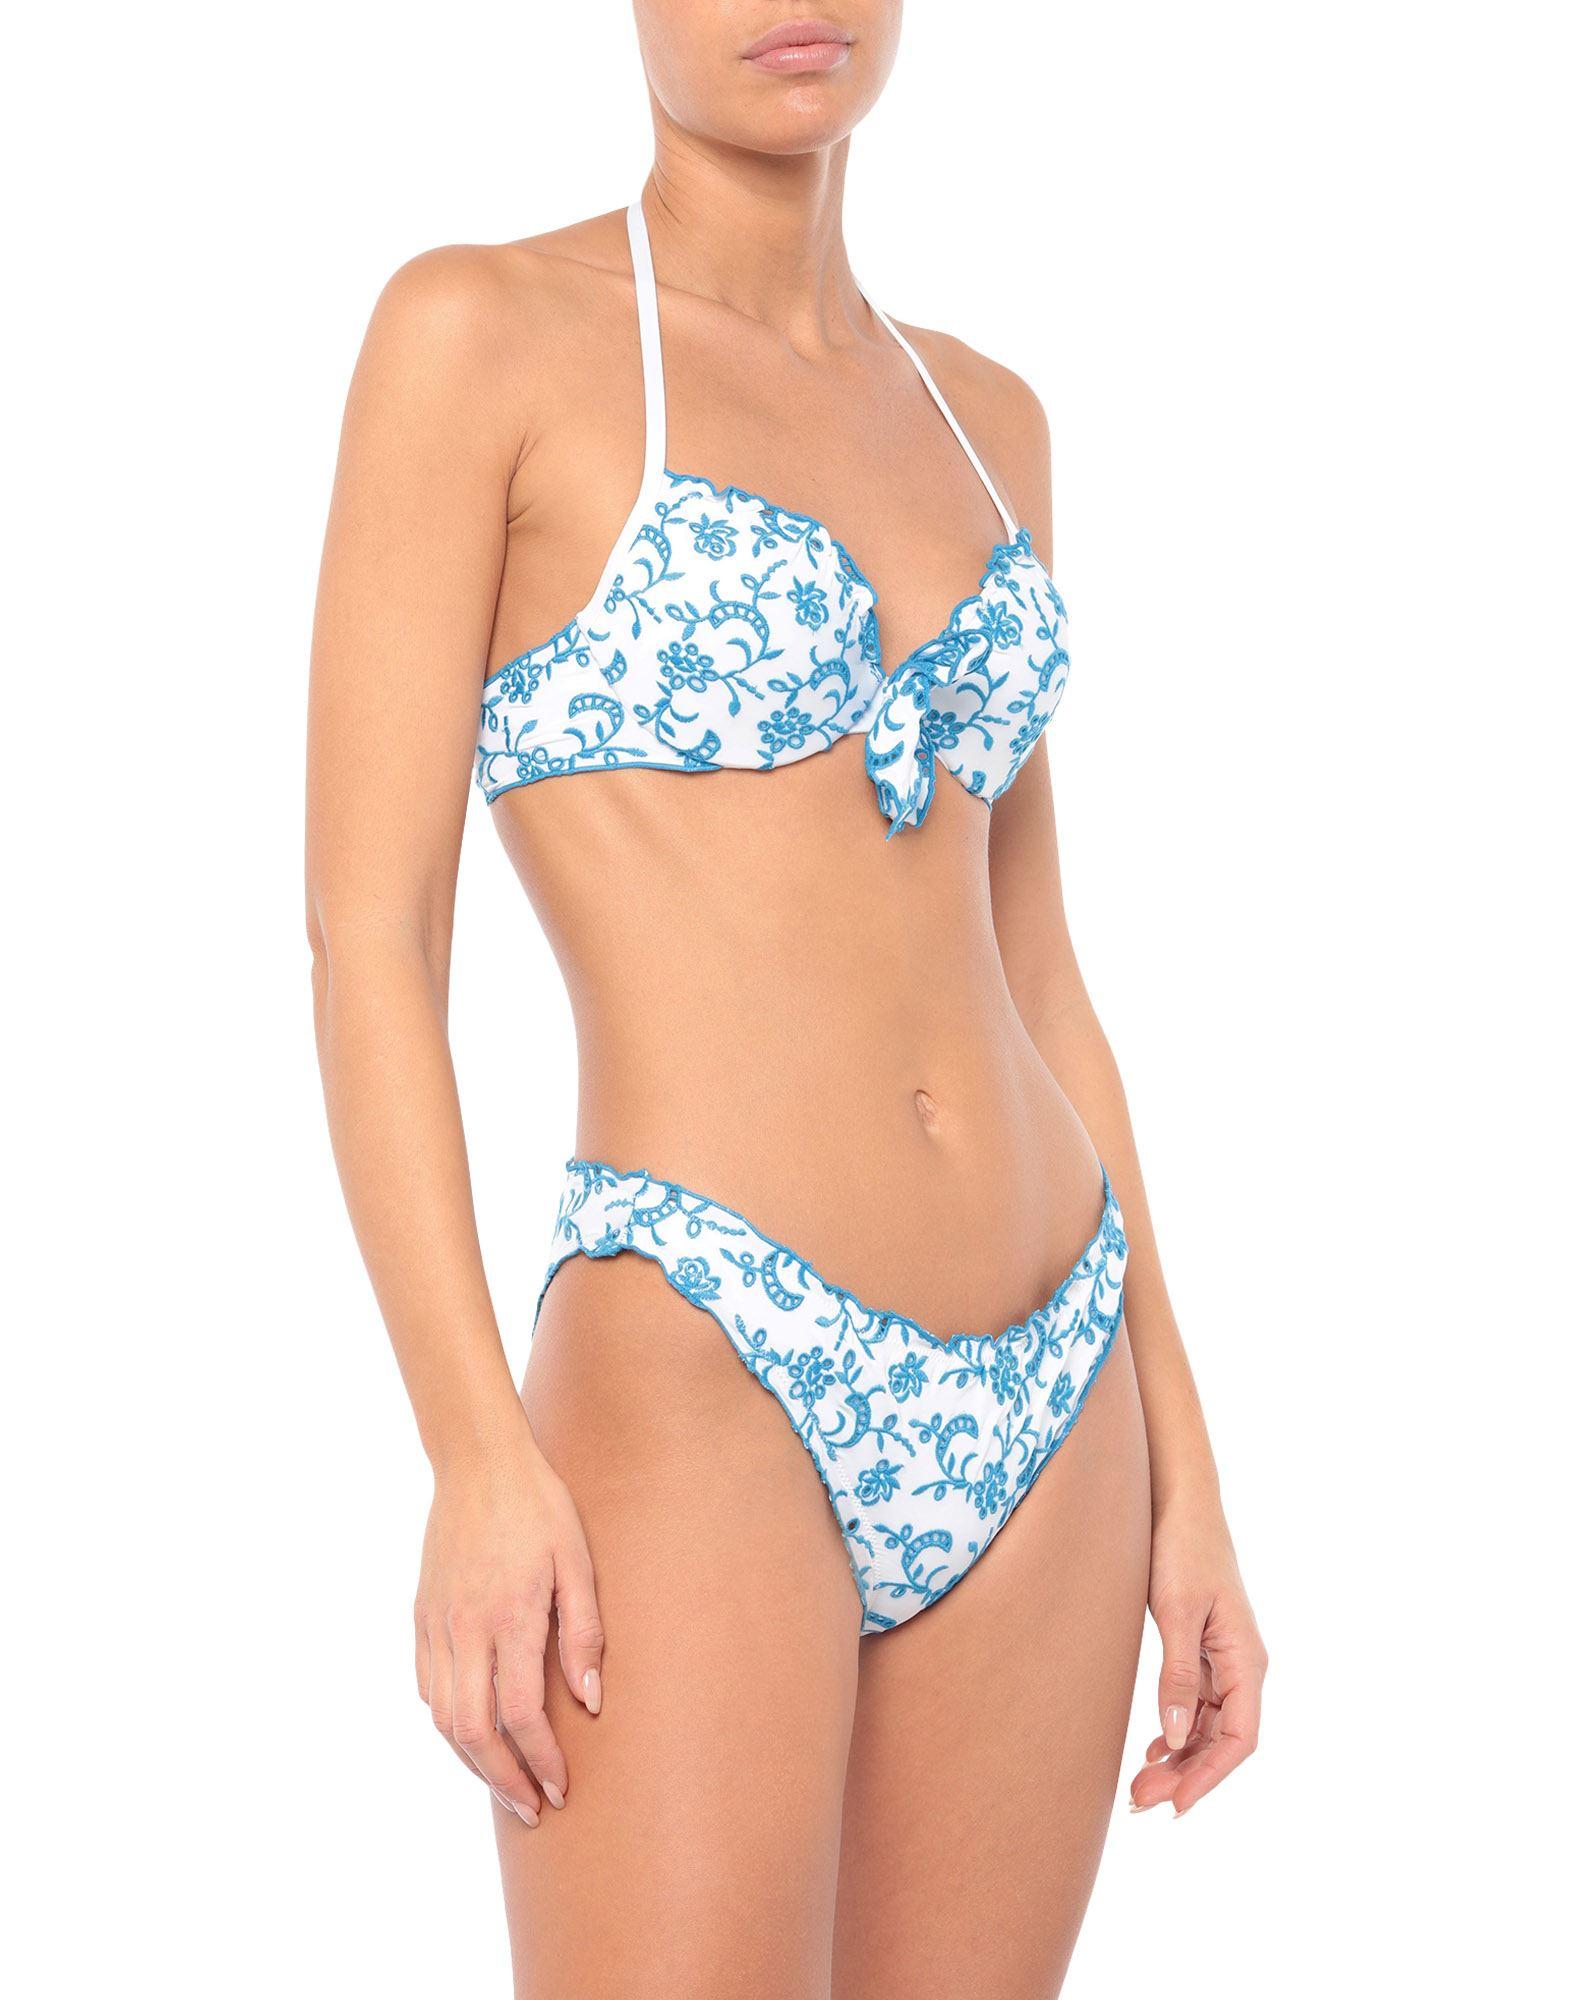 TWINSET Bikinis - Item 47280013